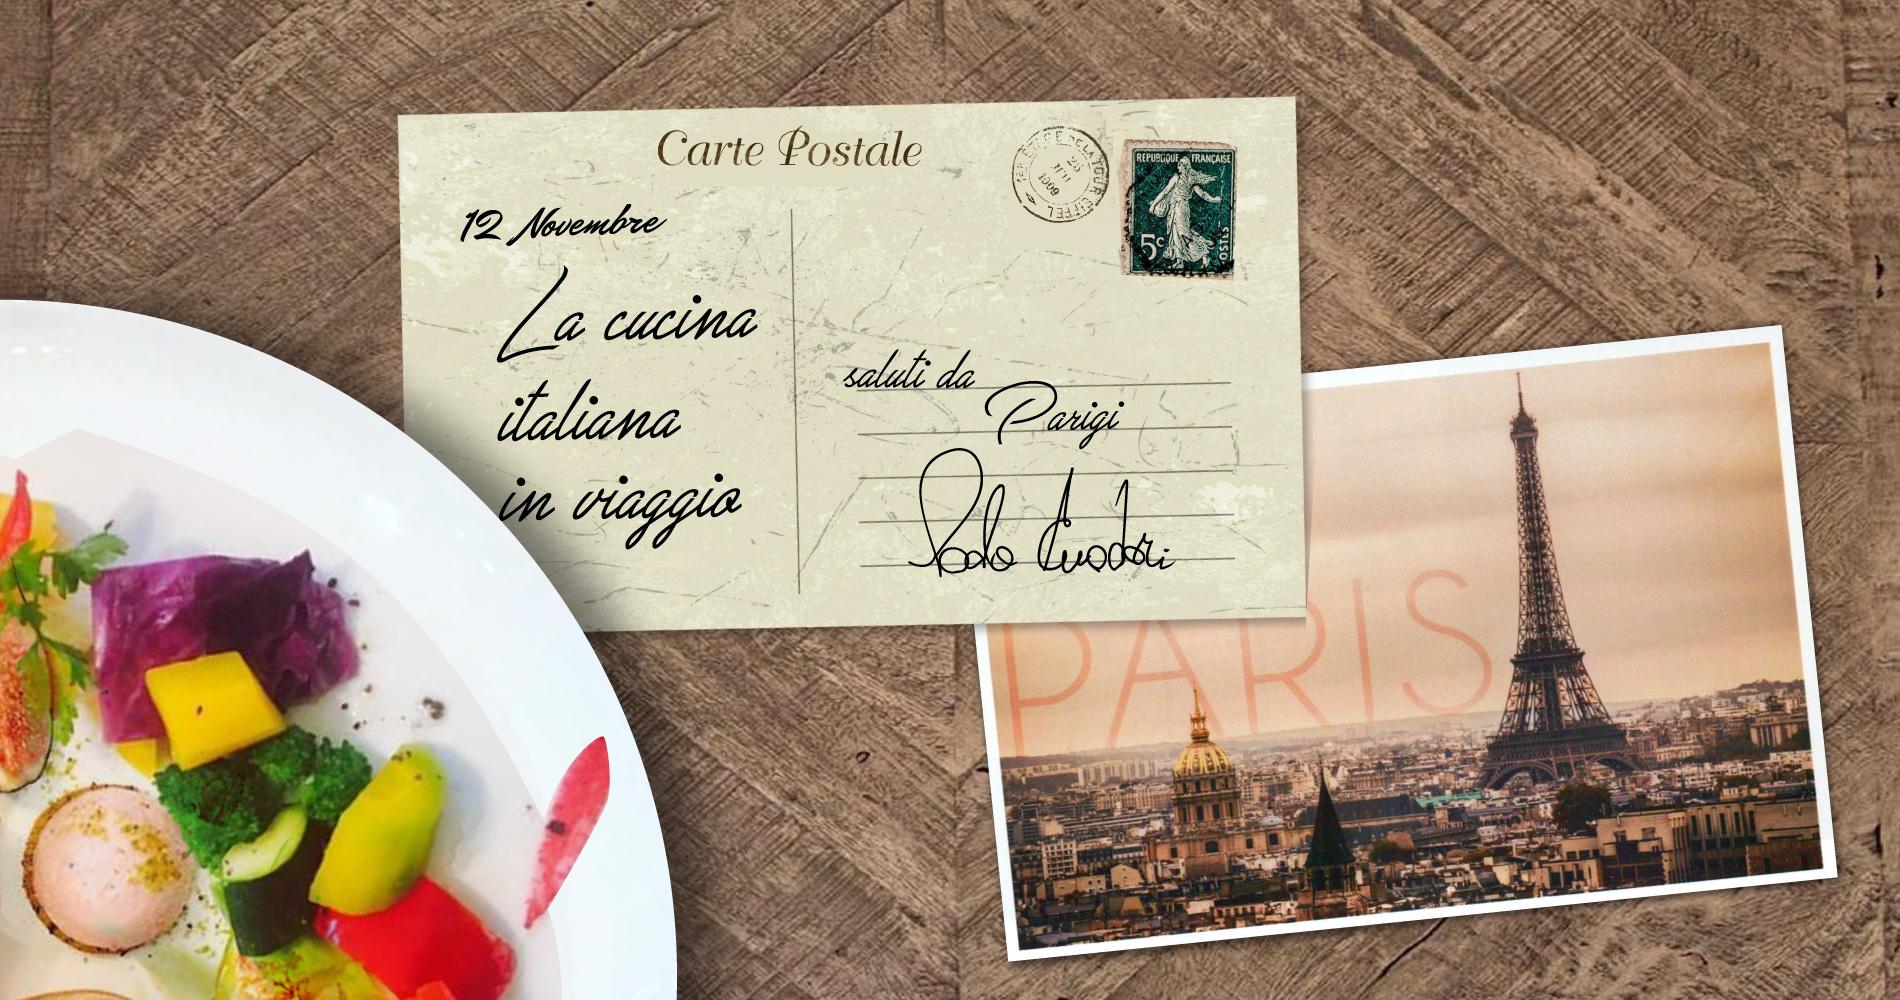 Cucina italiana in viaggio - Parigi